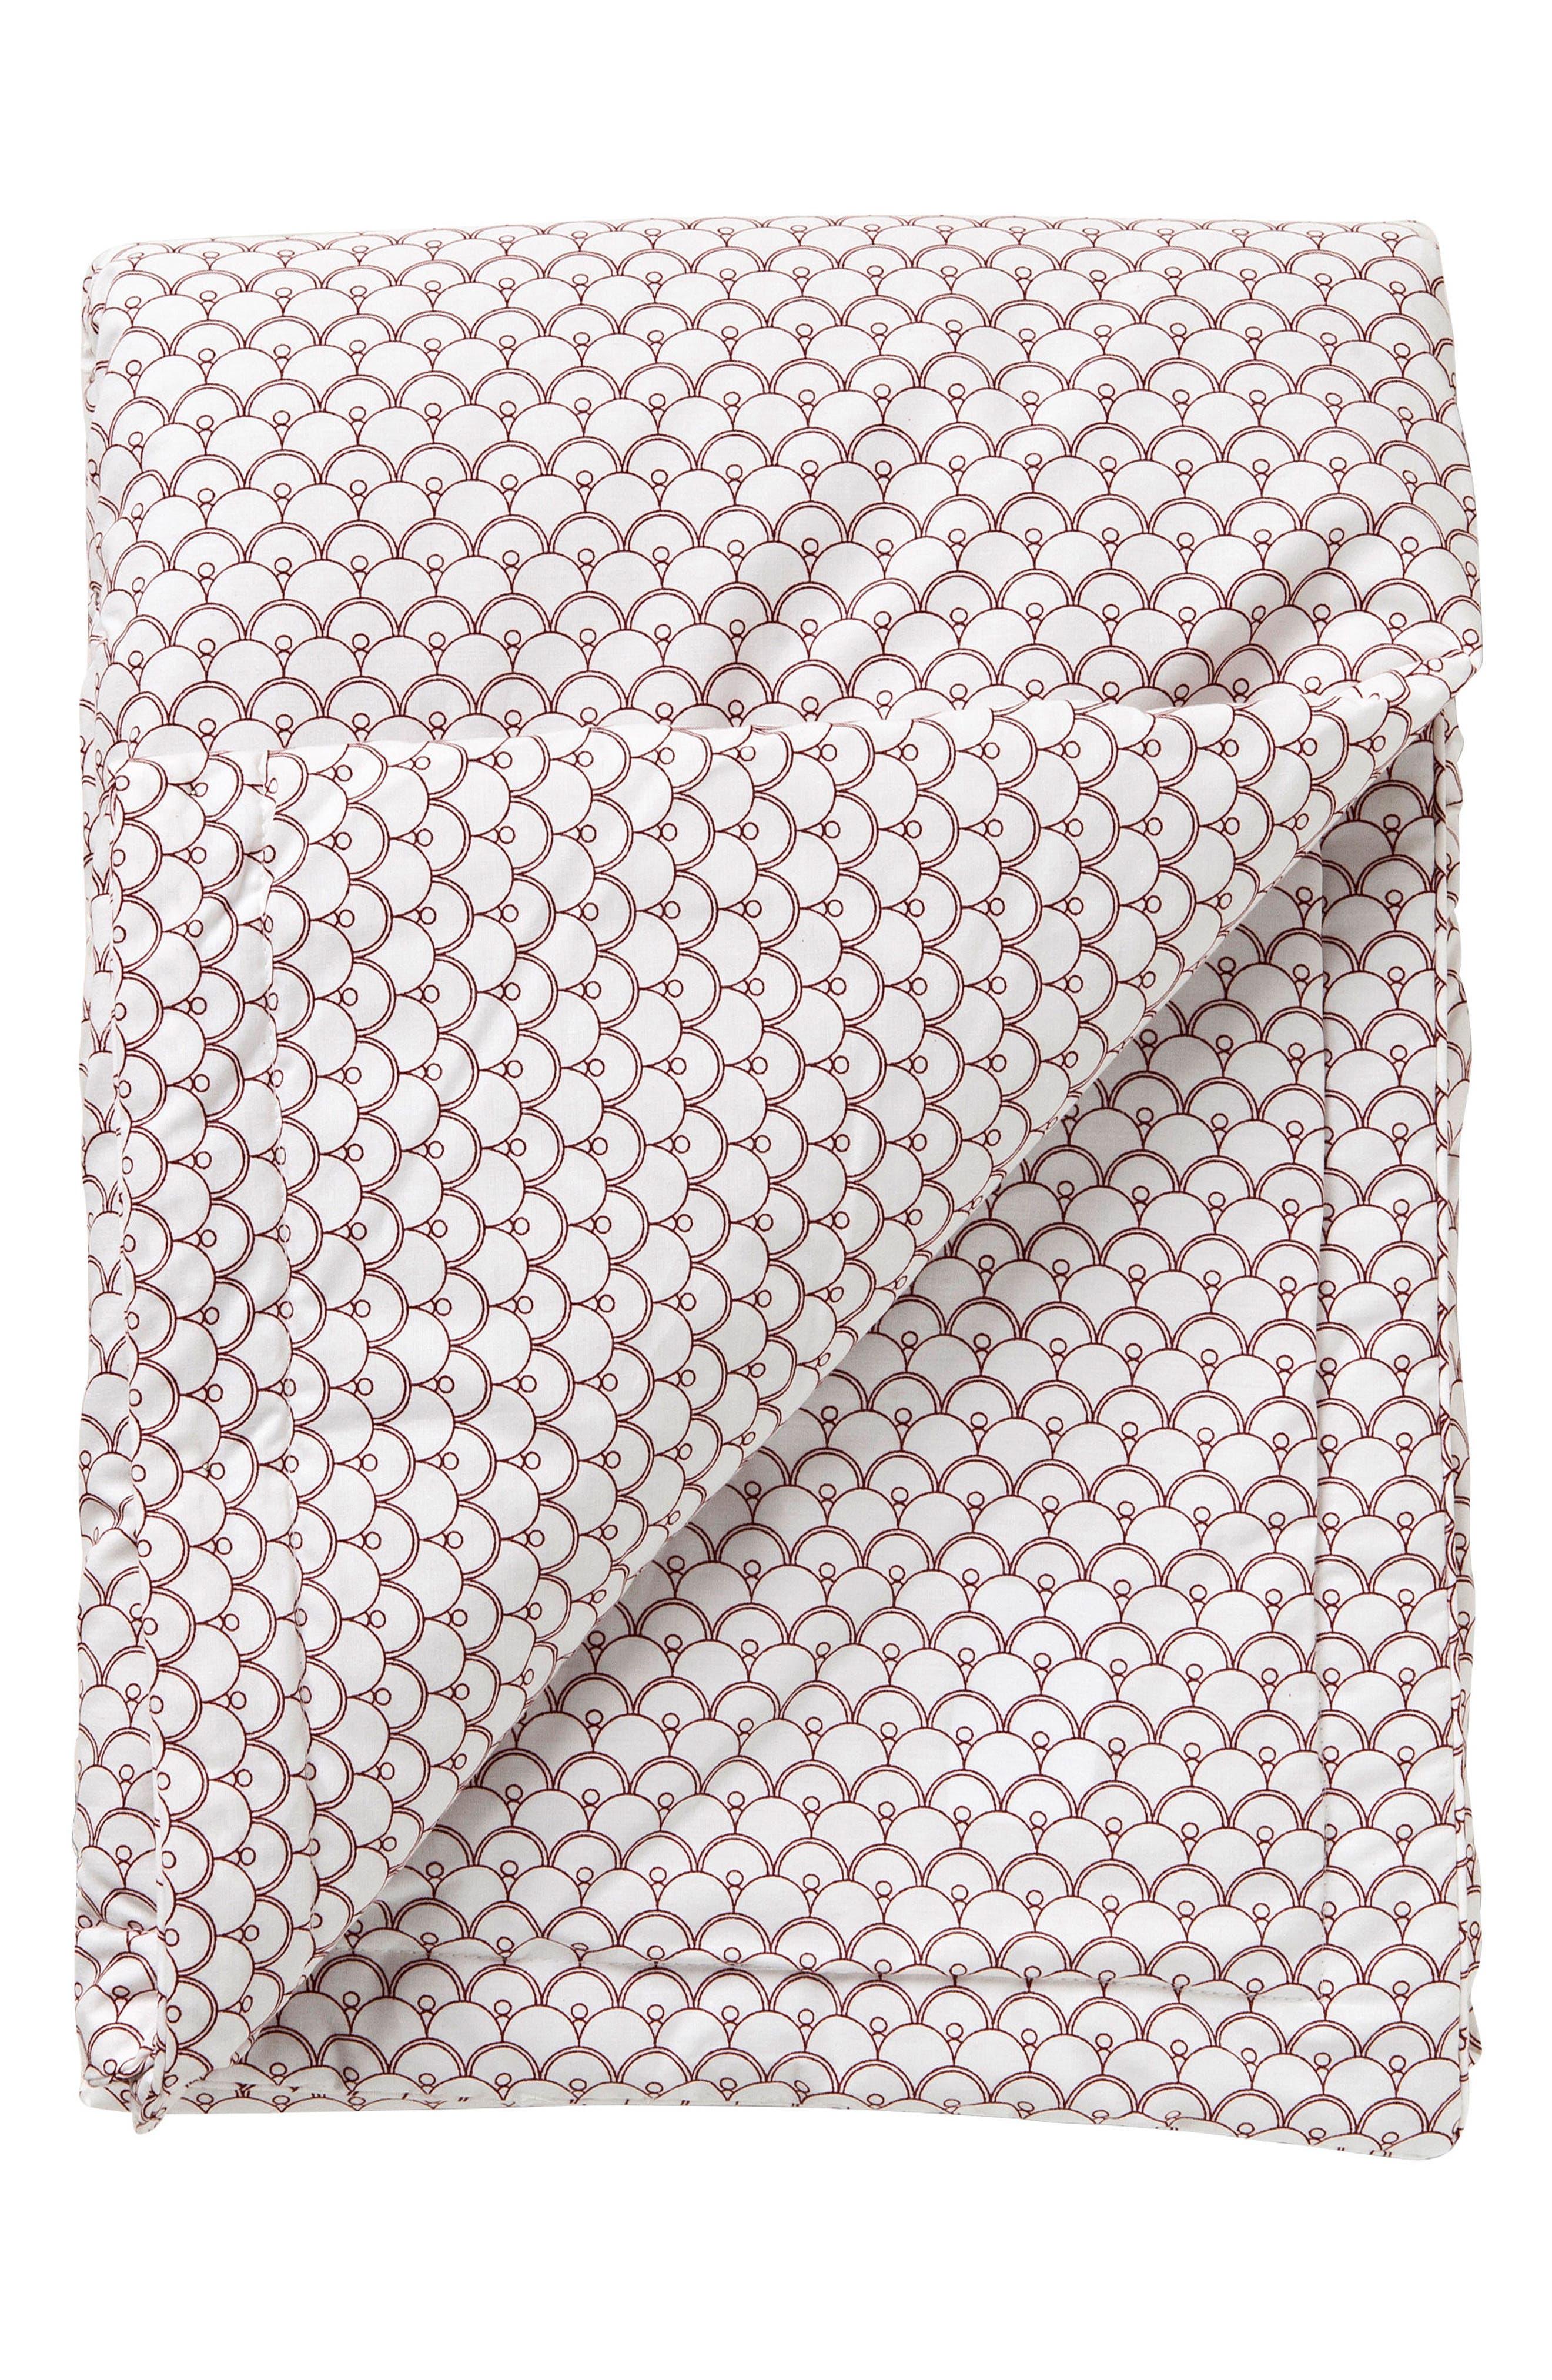 Cupola Play Blanket,                             Alternate thumbnail 2, color,                             Rust